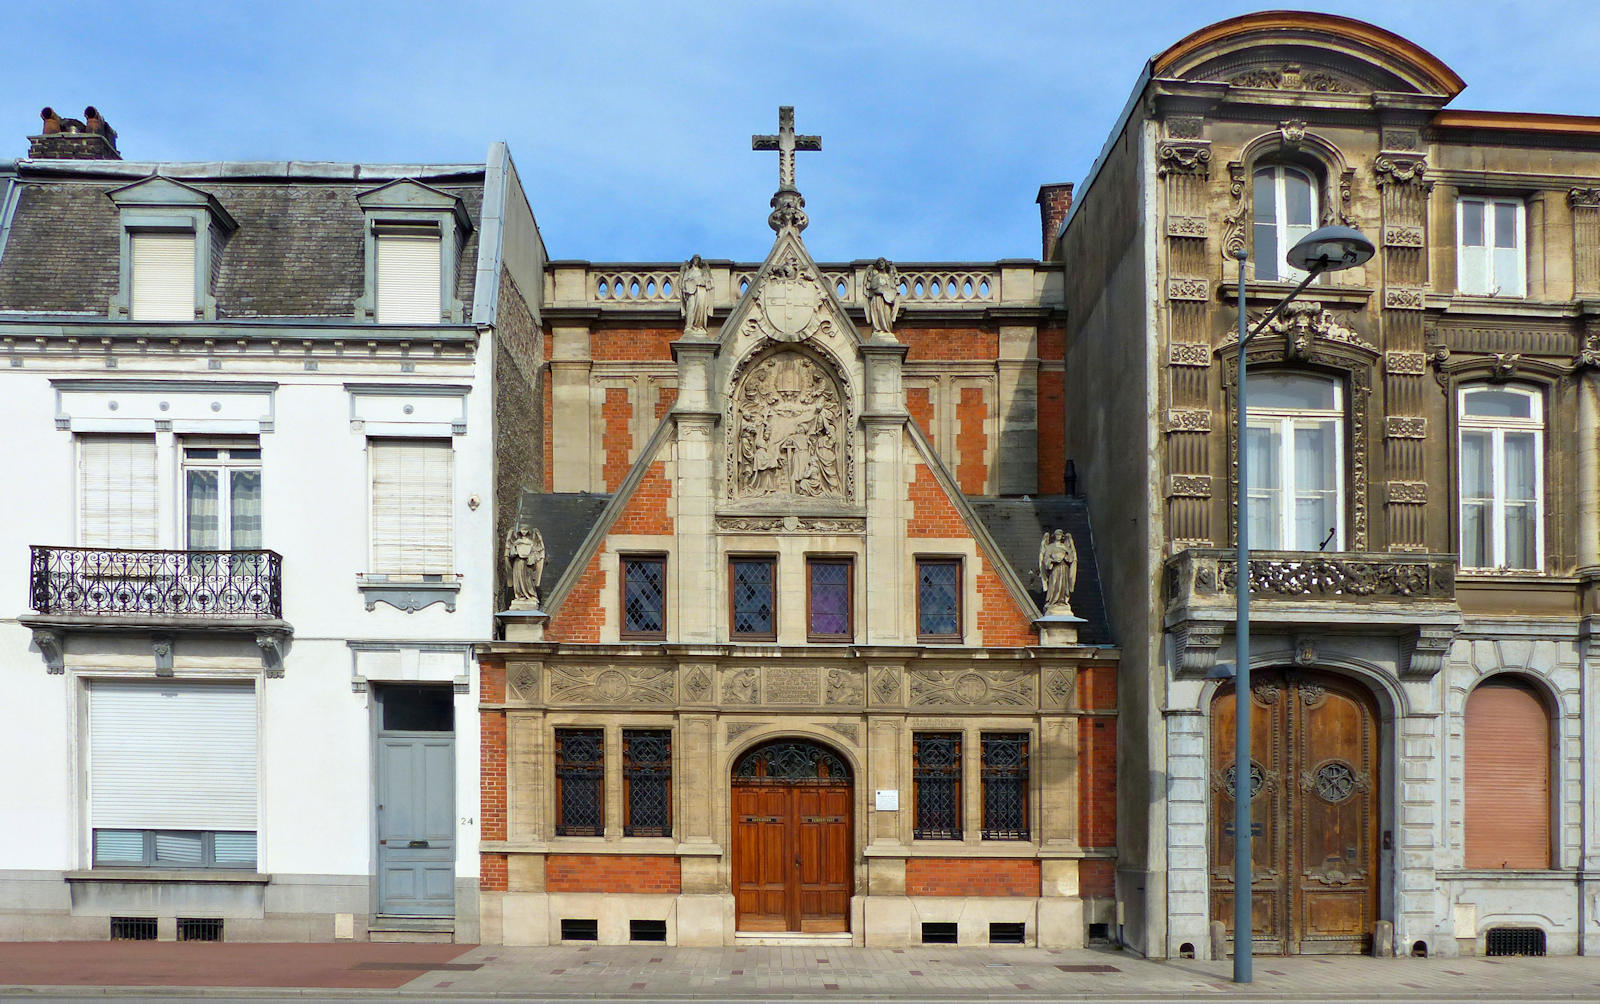 Chapelle du Voeu - 18 rue Faidherbe, Tourcoing